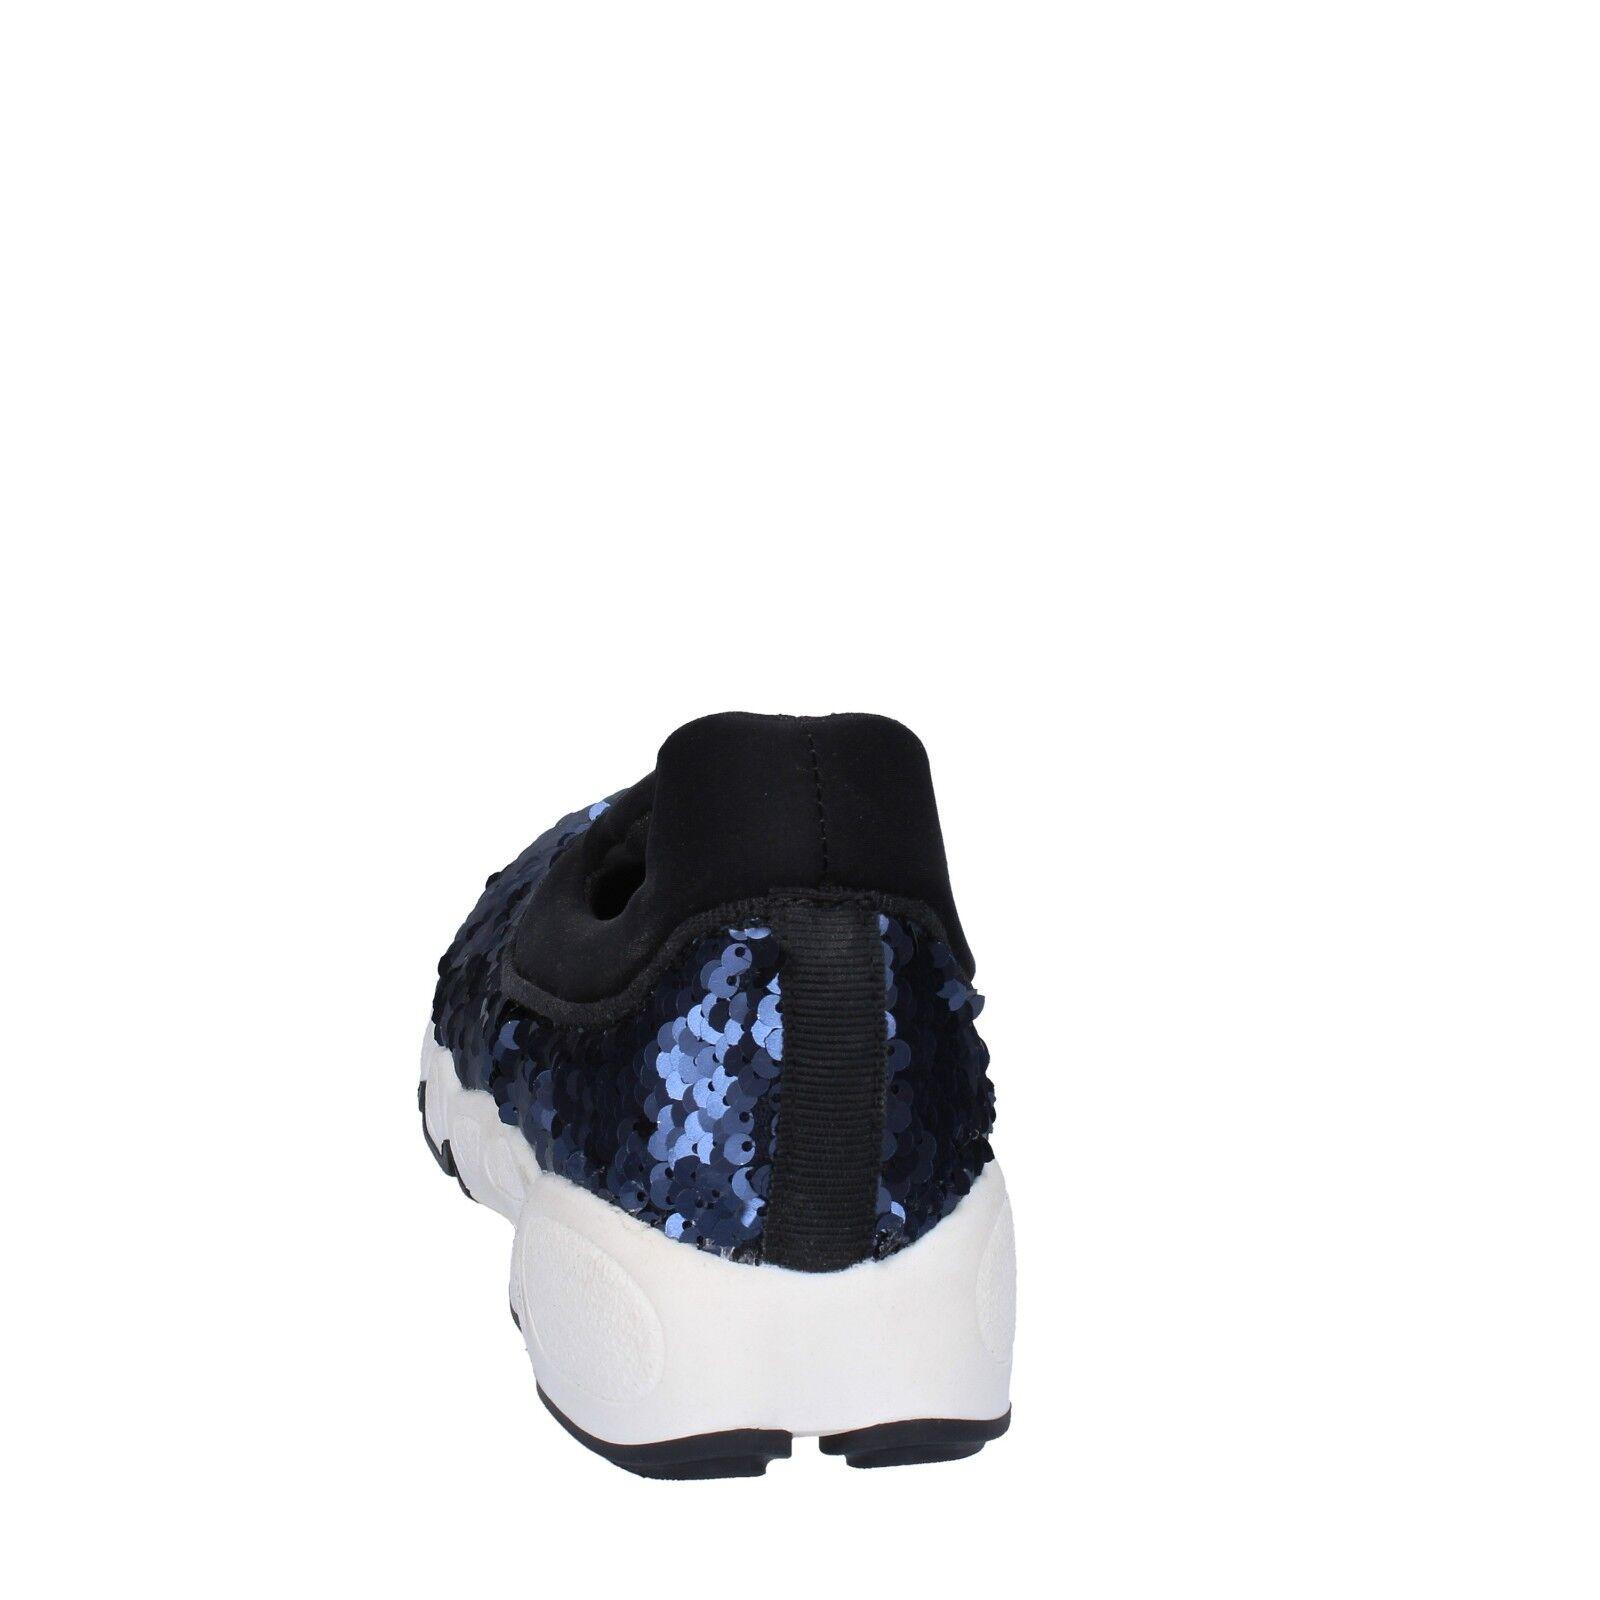 Damens's schuhe OLGA moccasins RUBINI 2 (EU 35) moccasins OLGA slip on Blau paillettes BX787-35 faf13d